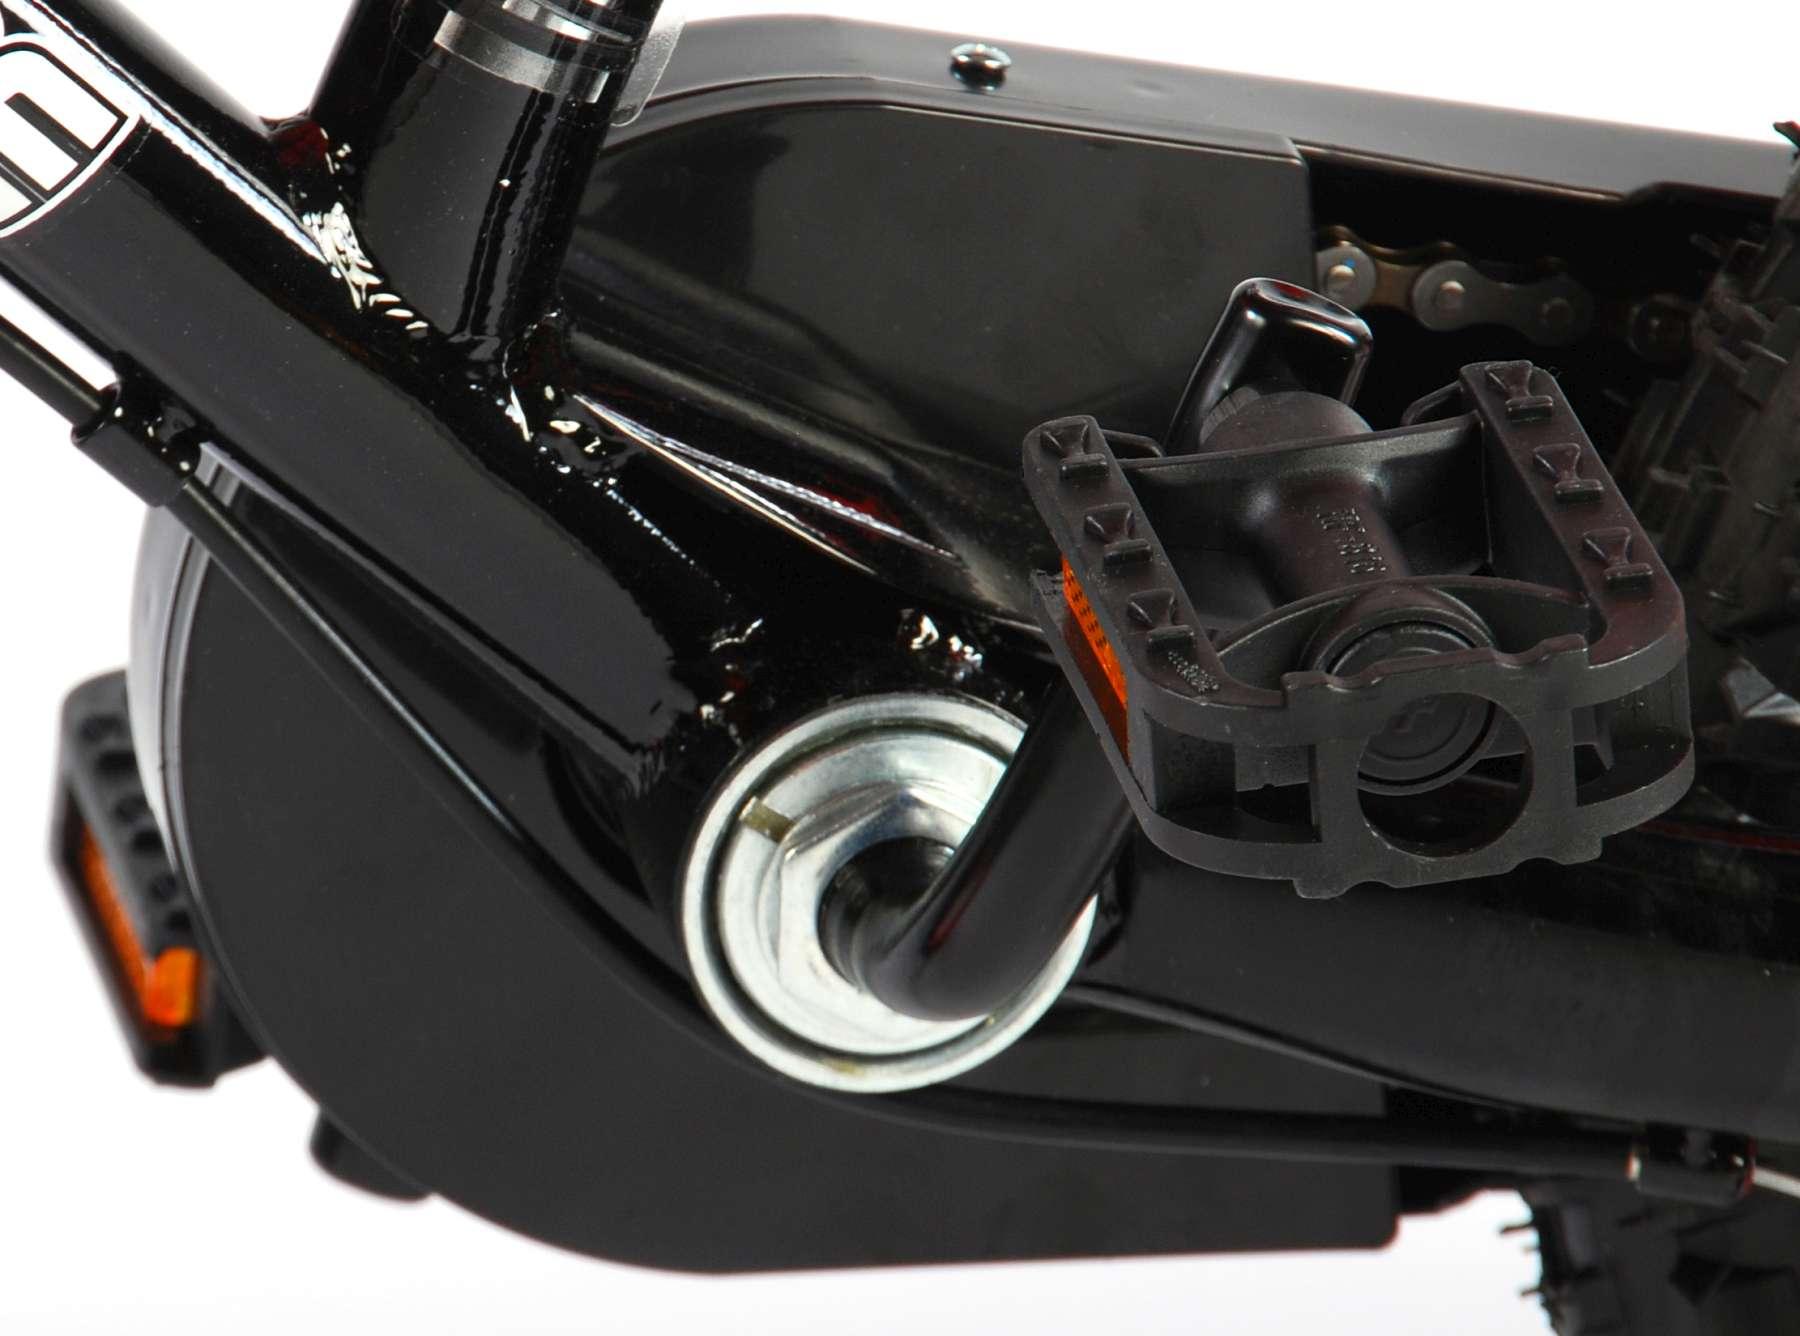 Bicicleta Motorbike de 12 pulgadas Naranja - pedales